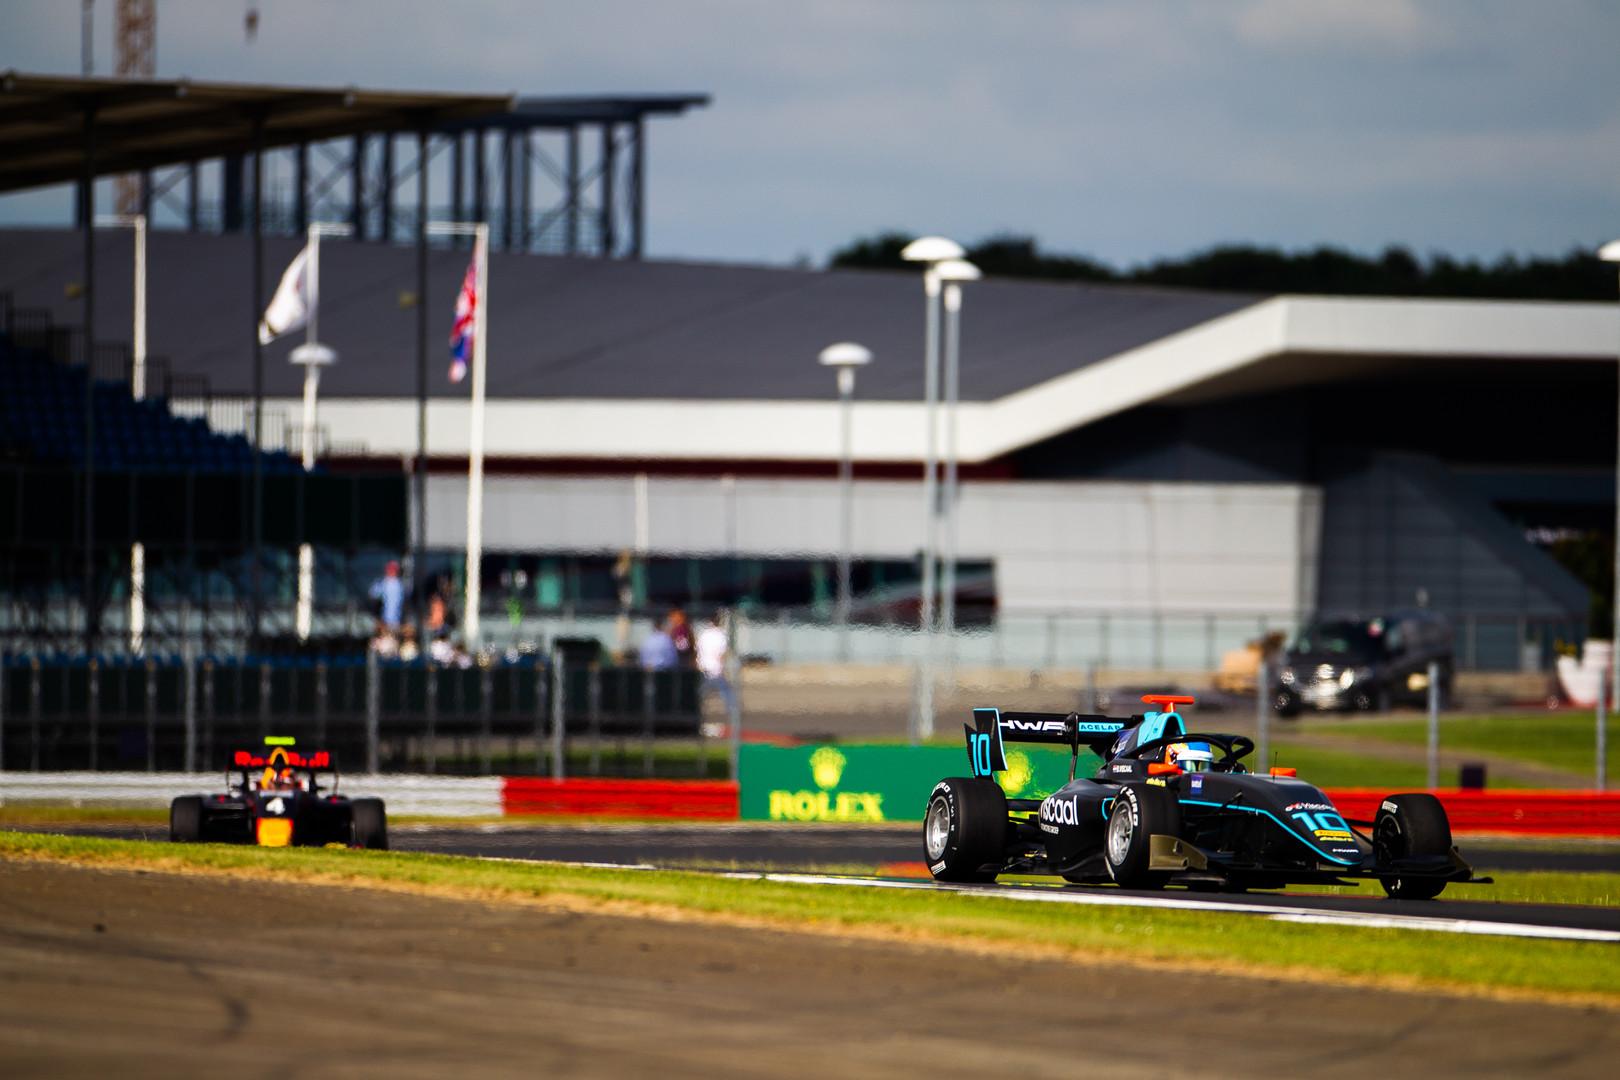 Bent F3 Silverstone 14-07-2019-6.jpg